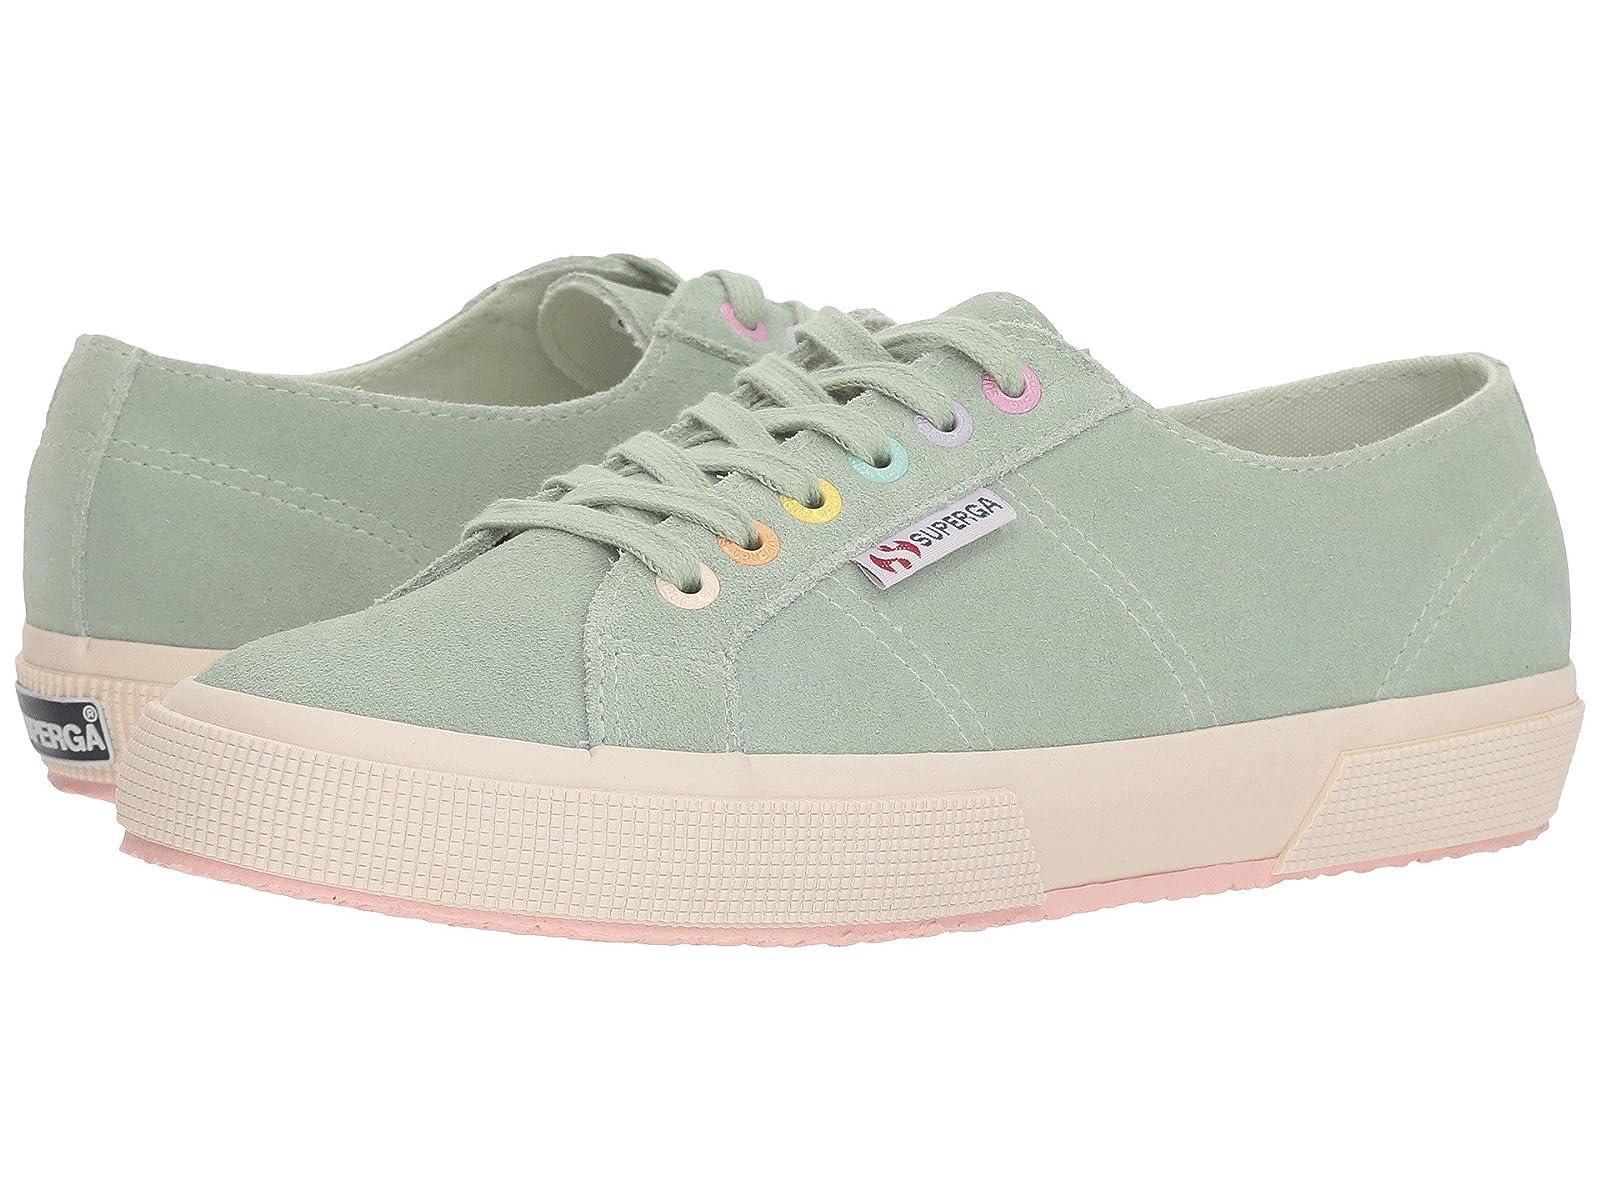 Superga 2750 Suecotlinc SneakerAtmospheric grades have affordable shoes